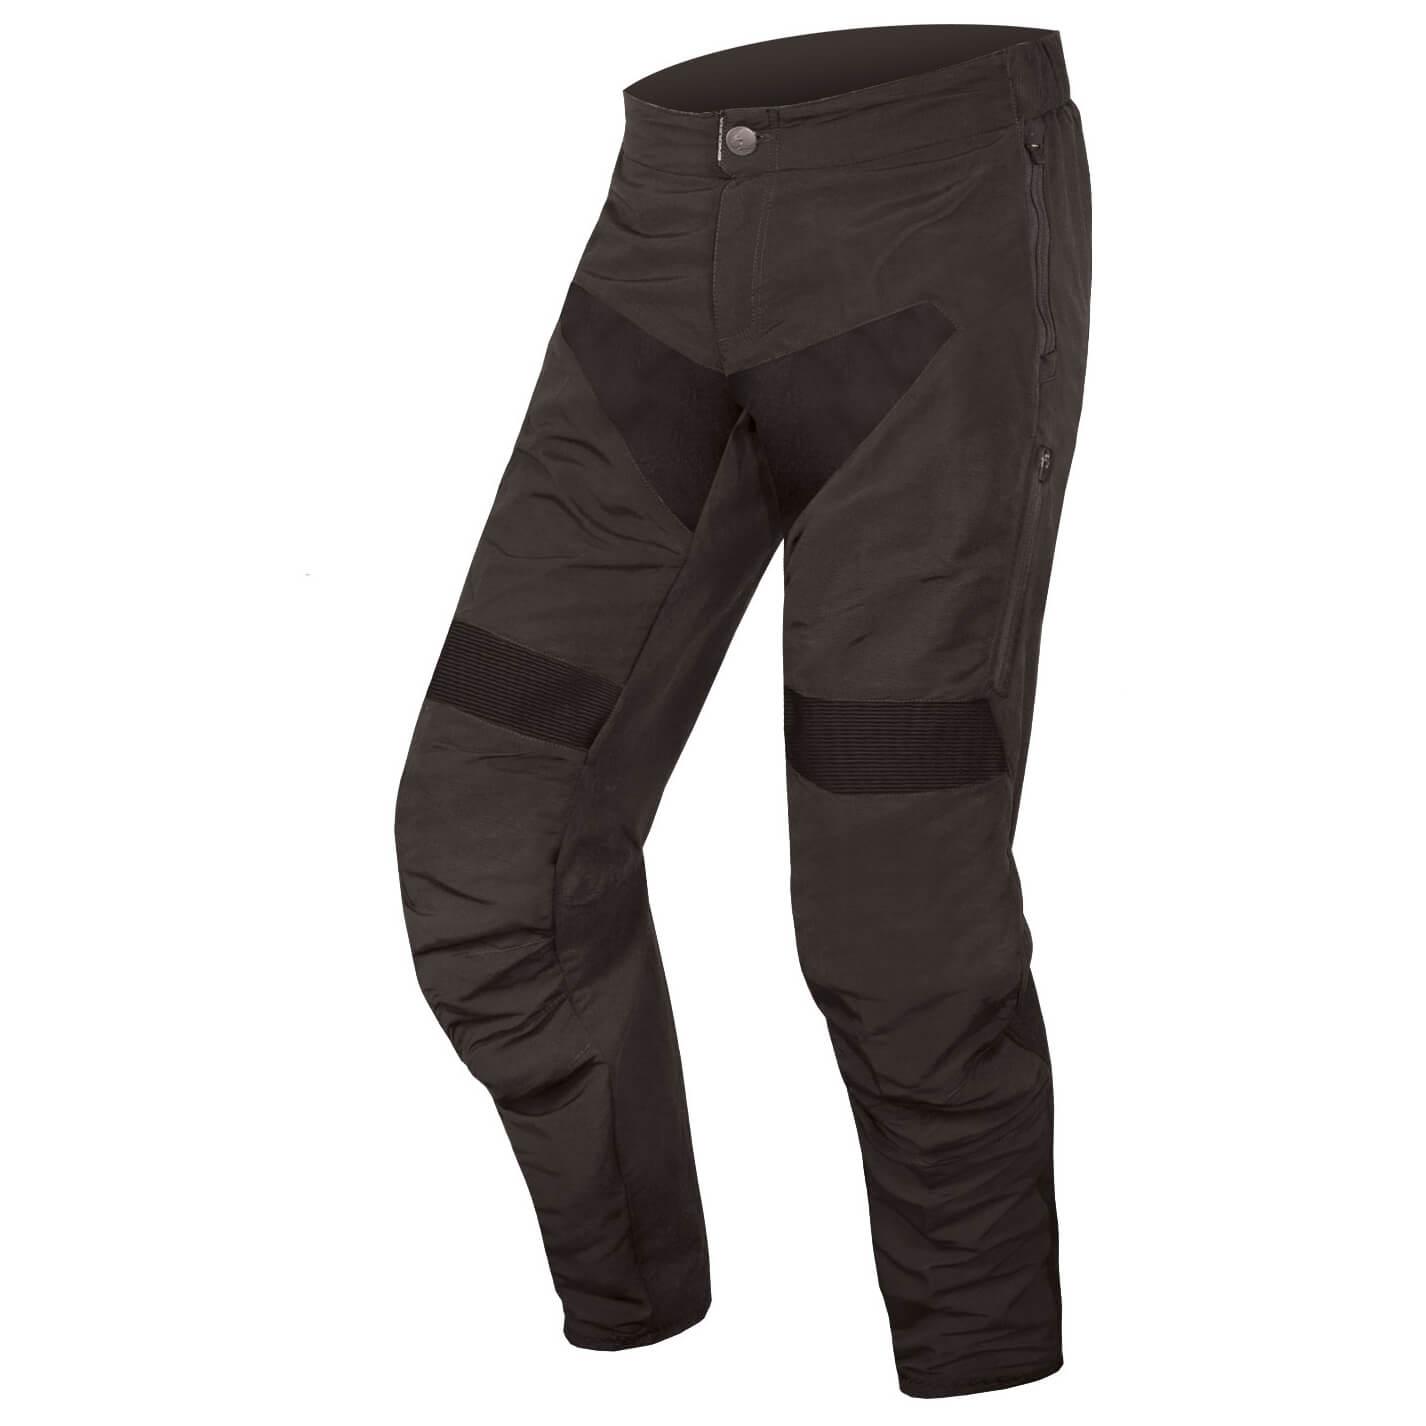 endura singletrack hose cycling pants men 39 s free uk. Black Bedroom Furniture Sets. Home Design Ideas